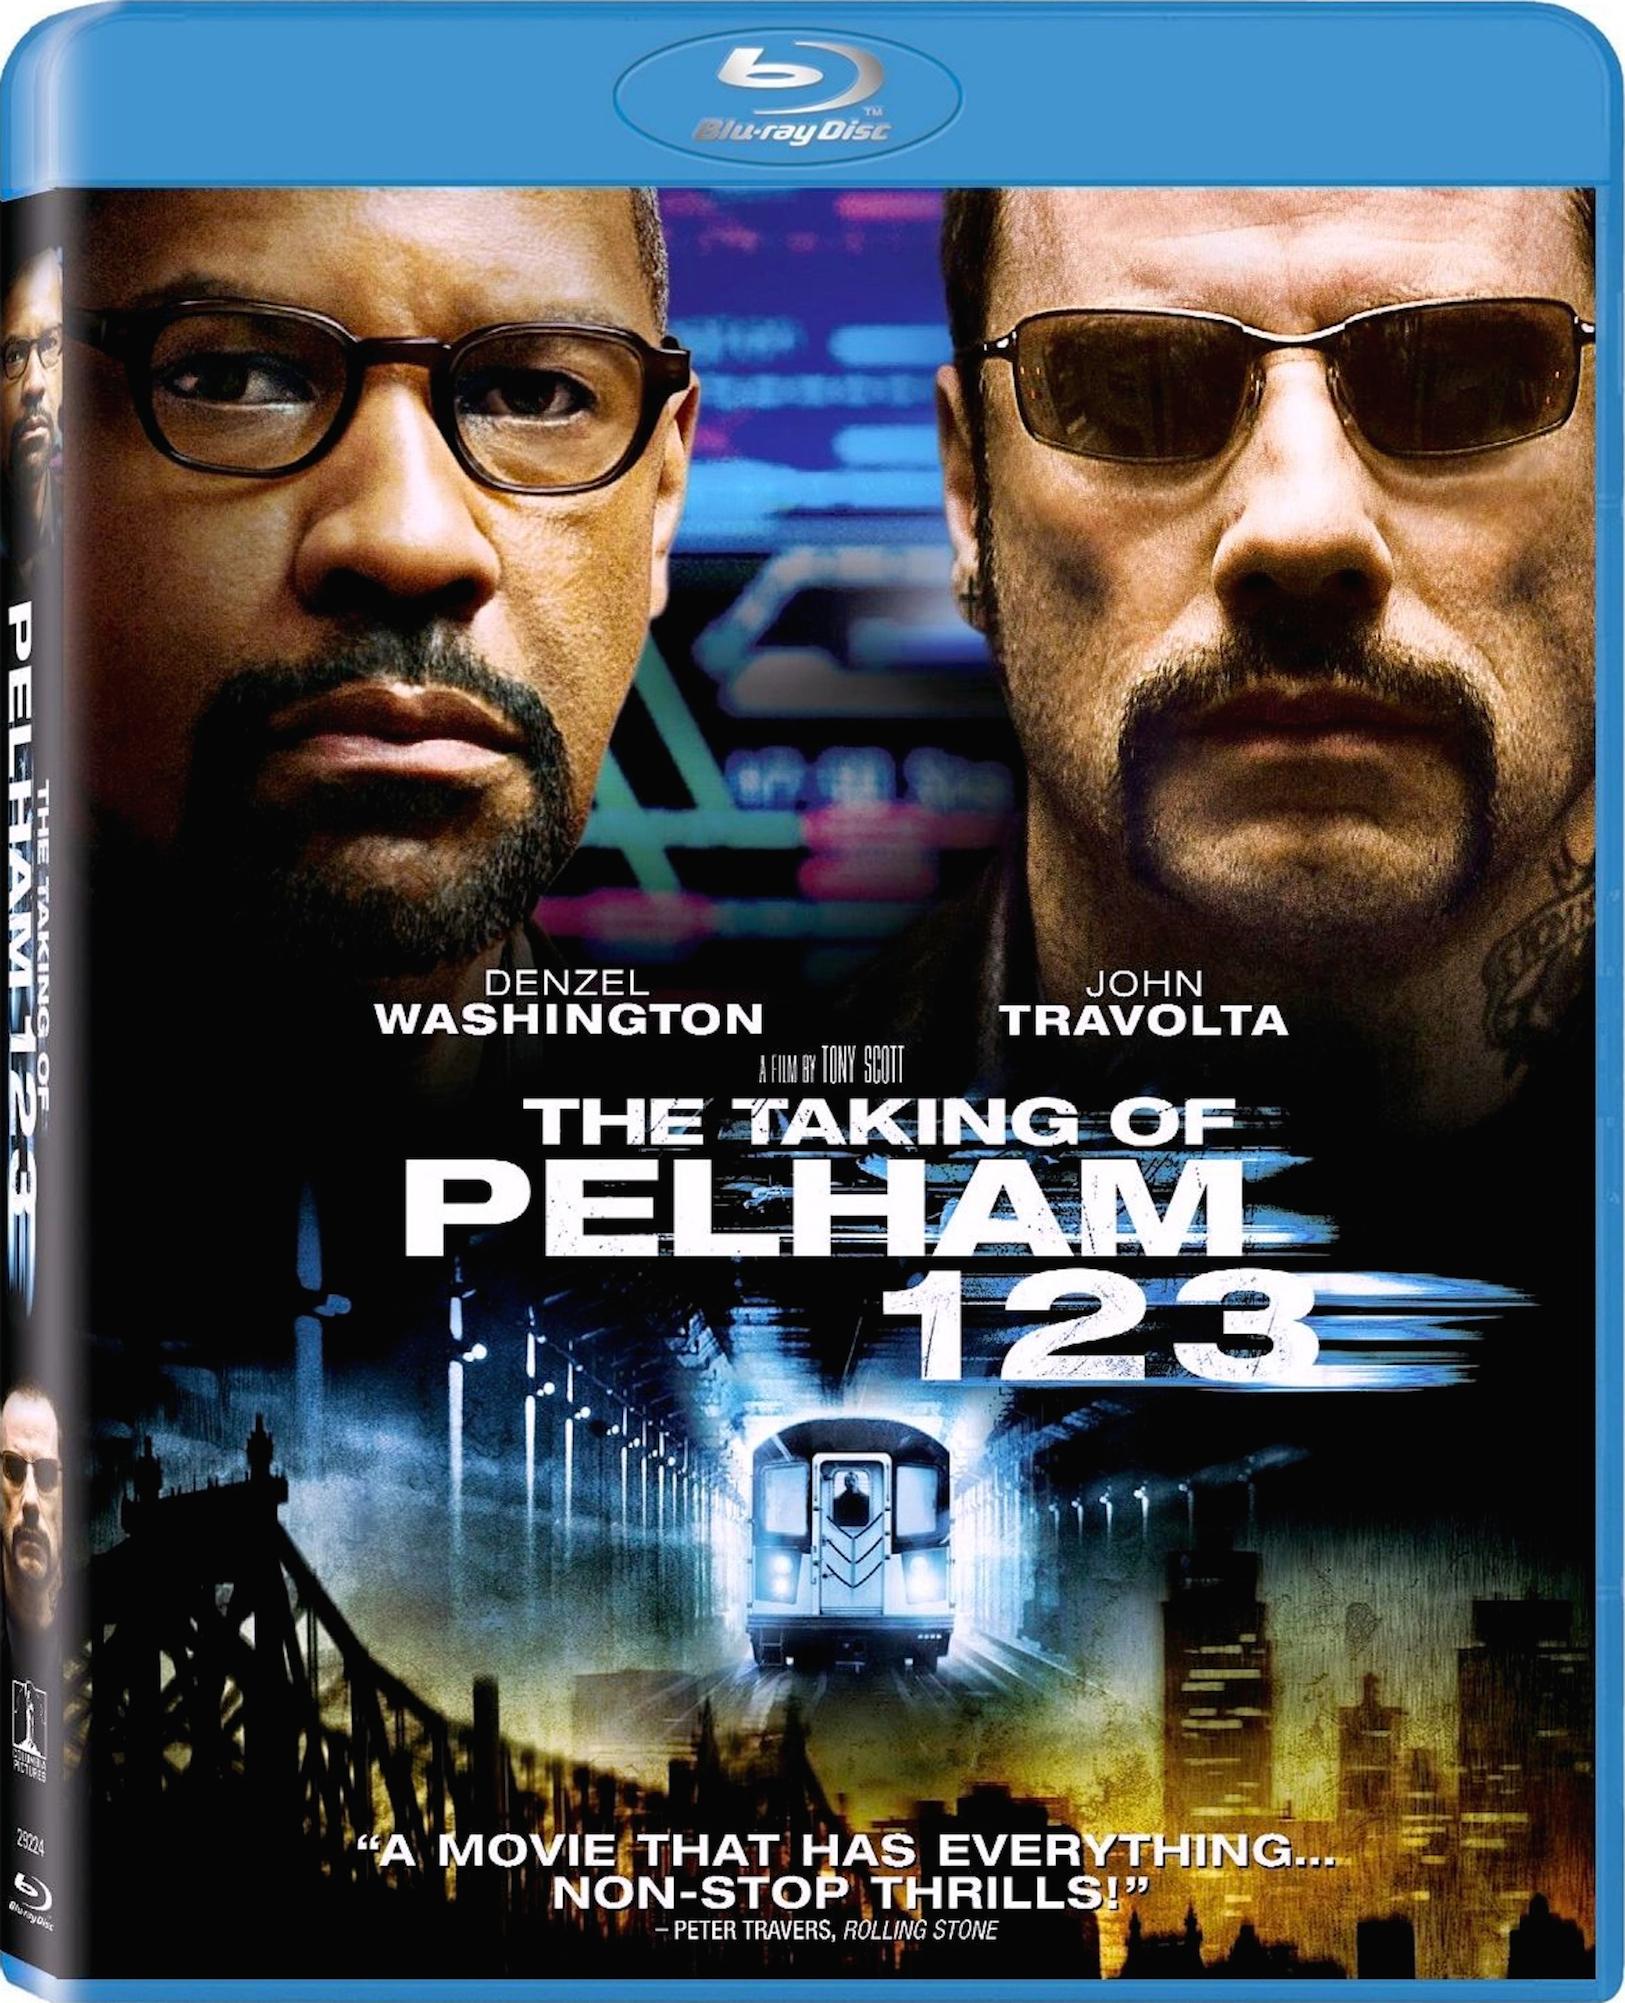 The Taking of Pelham 123 (2009) Subtitles in English Free ...